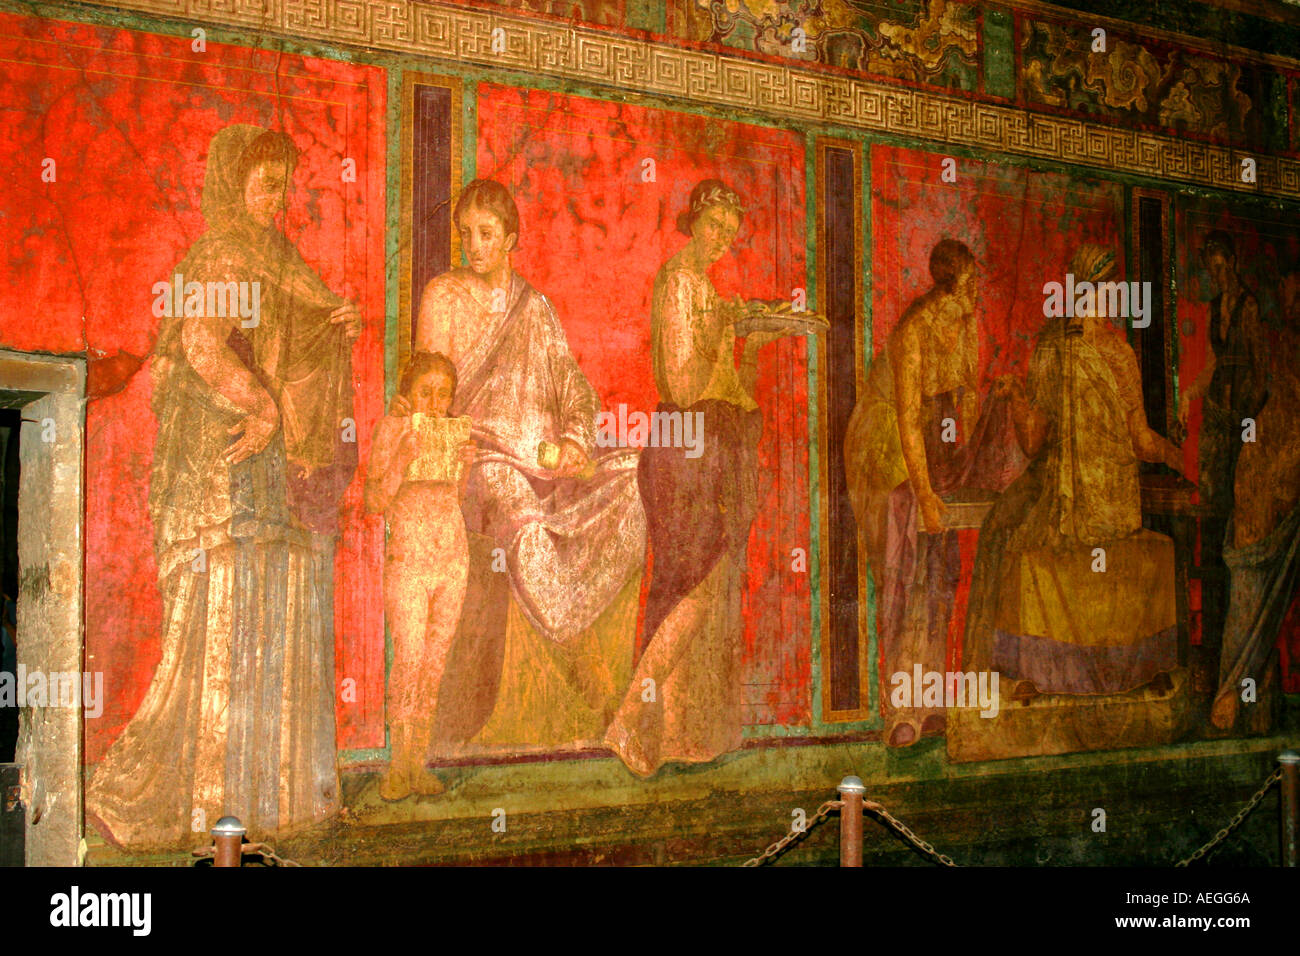 Wall Painting at Villa dei misteri Pompeii Excavations Italy - Stock Image